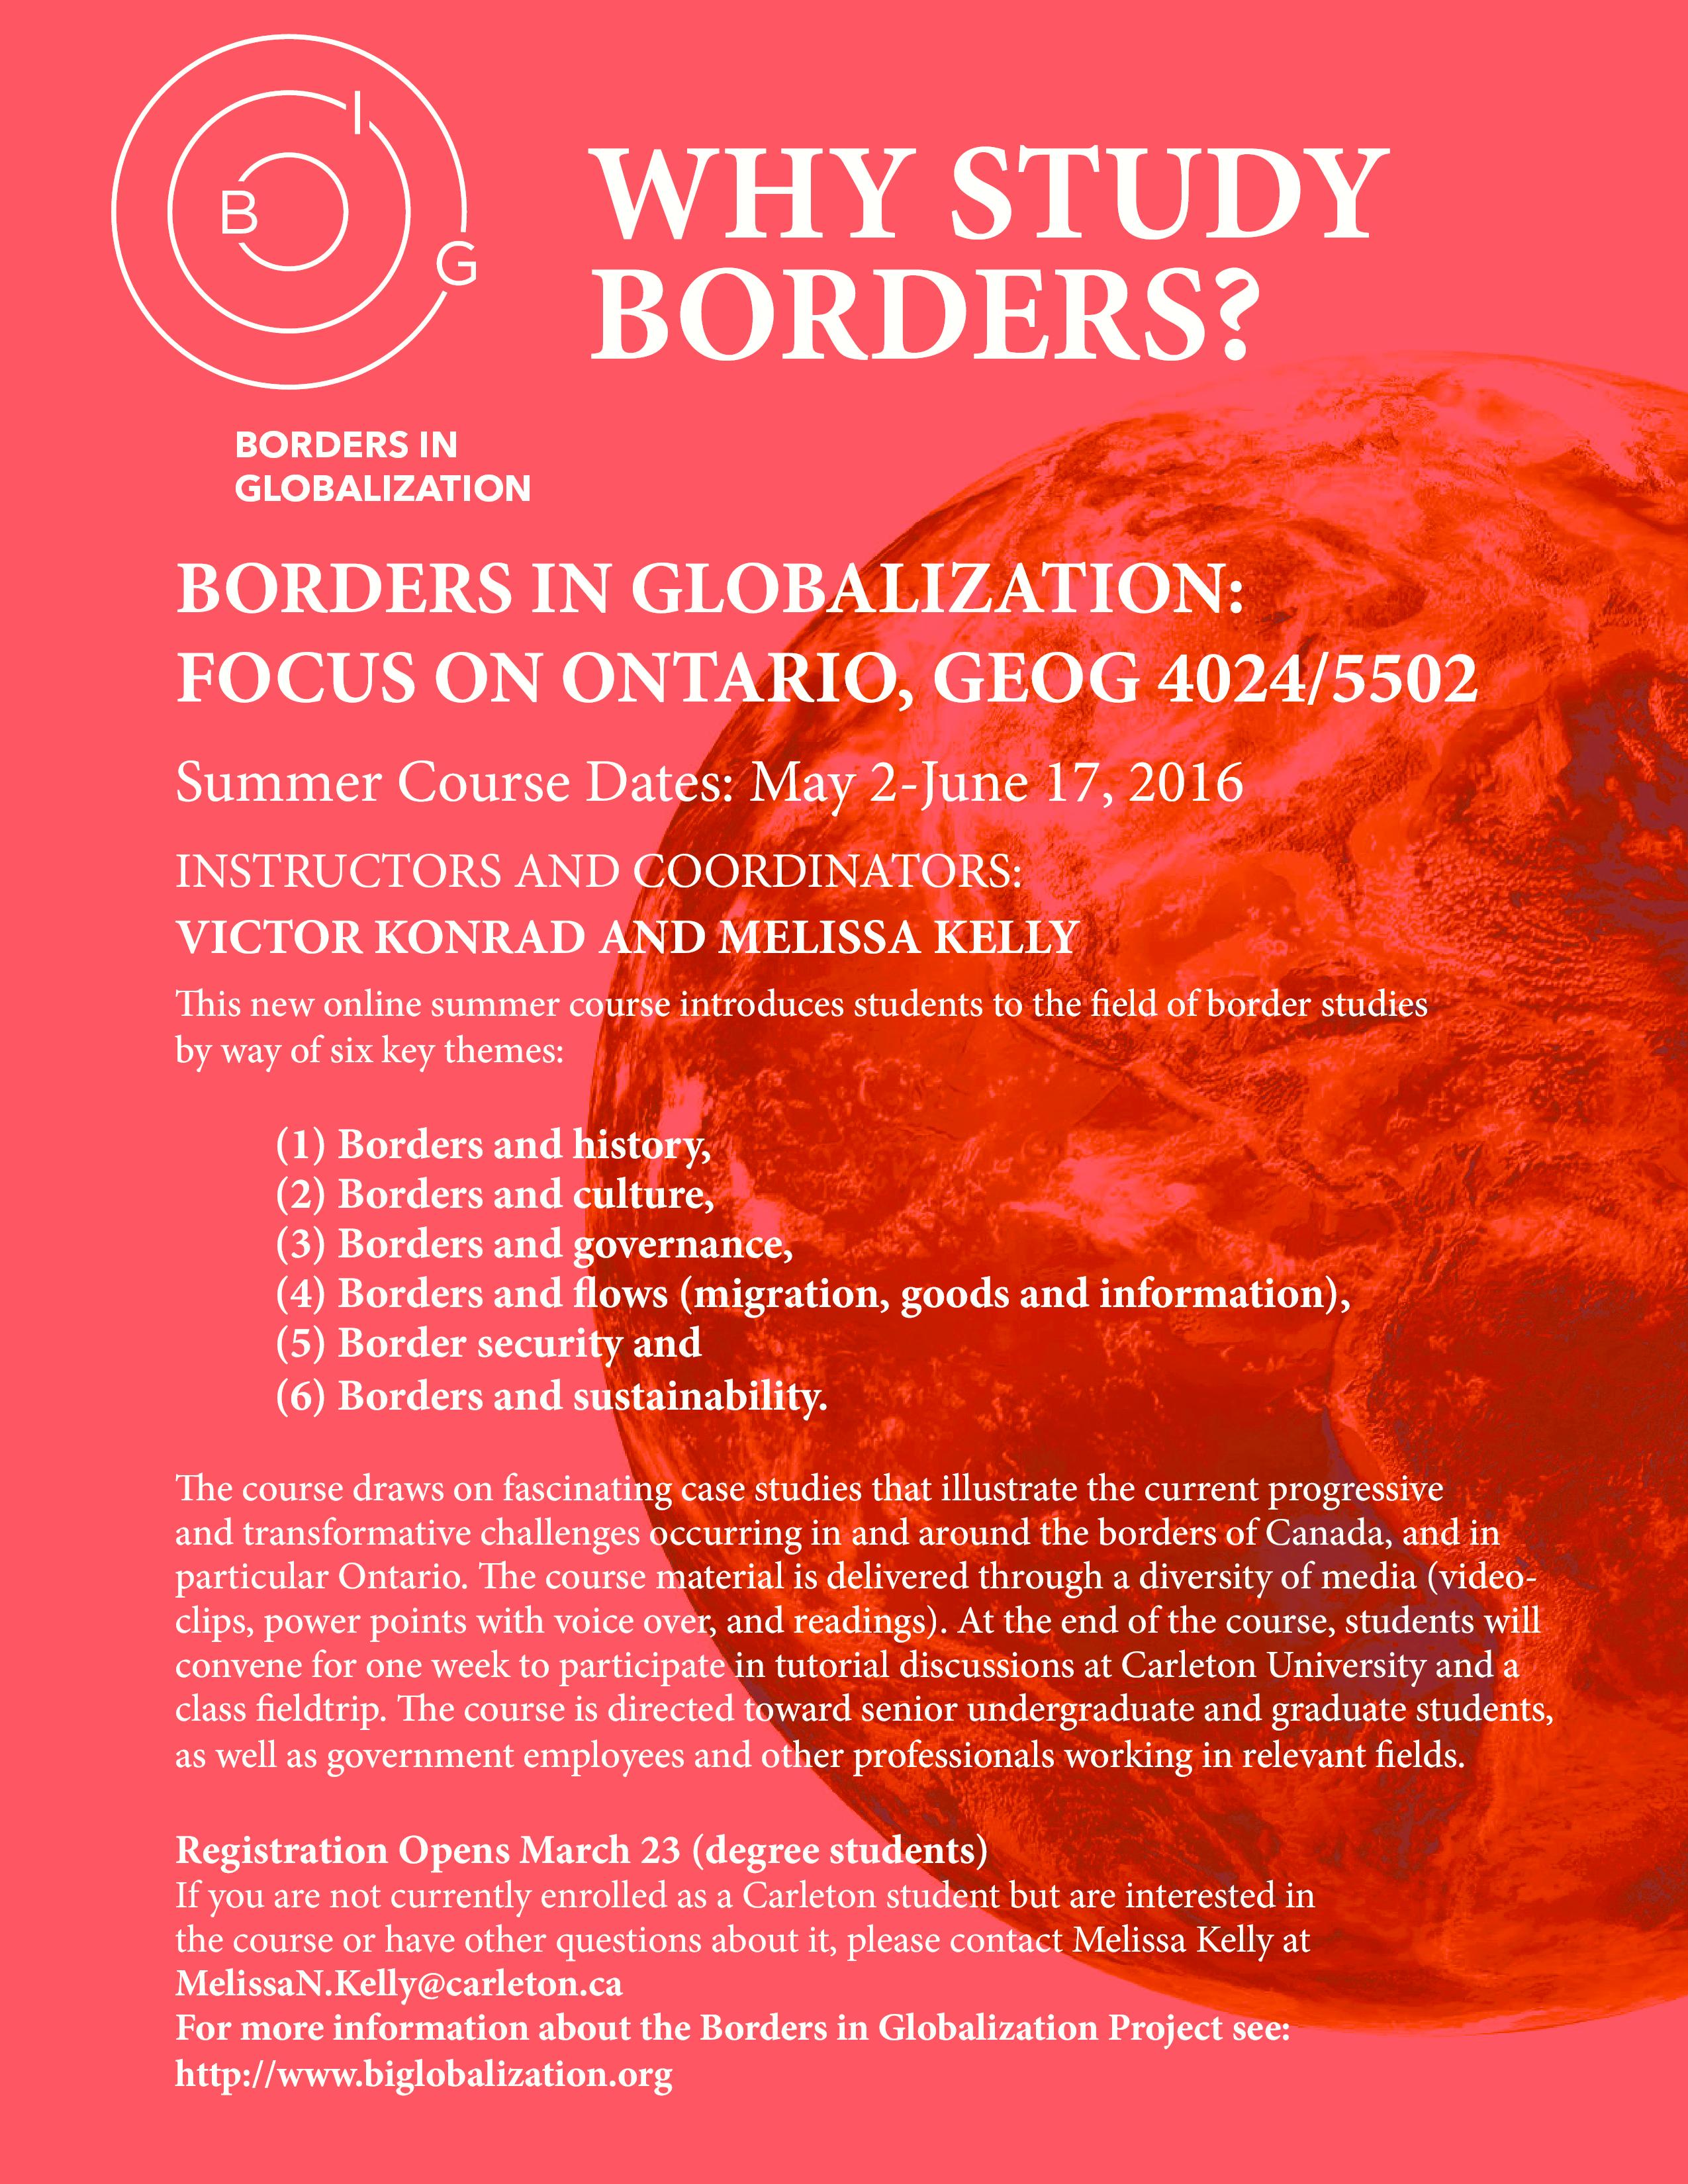 BORDERS IN GLOBALIZATION%2c CARLETON-0